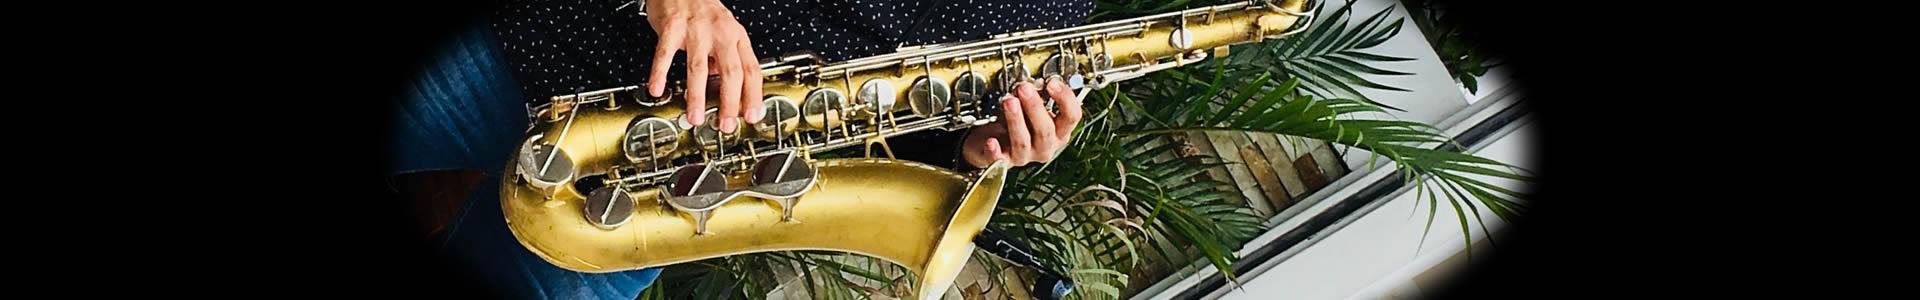 Giovanny Valenzuela – Saxofonista Profesional – SAXOSENTIDO – BARRANQUILLA – SANTAMARTA – CARTAGENA – BUCARAMANGA -COLOMBIA